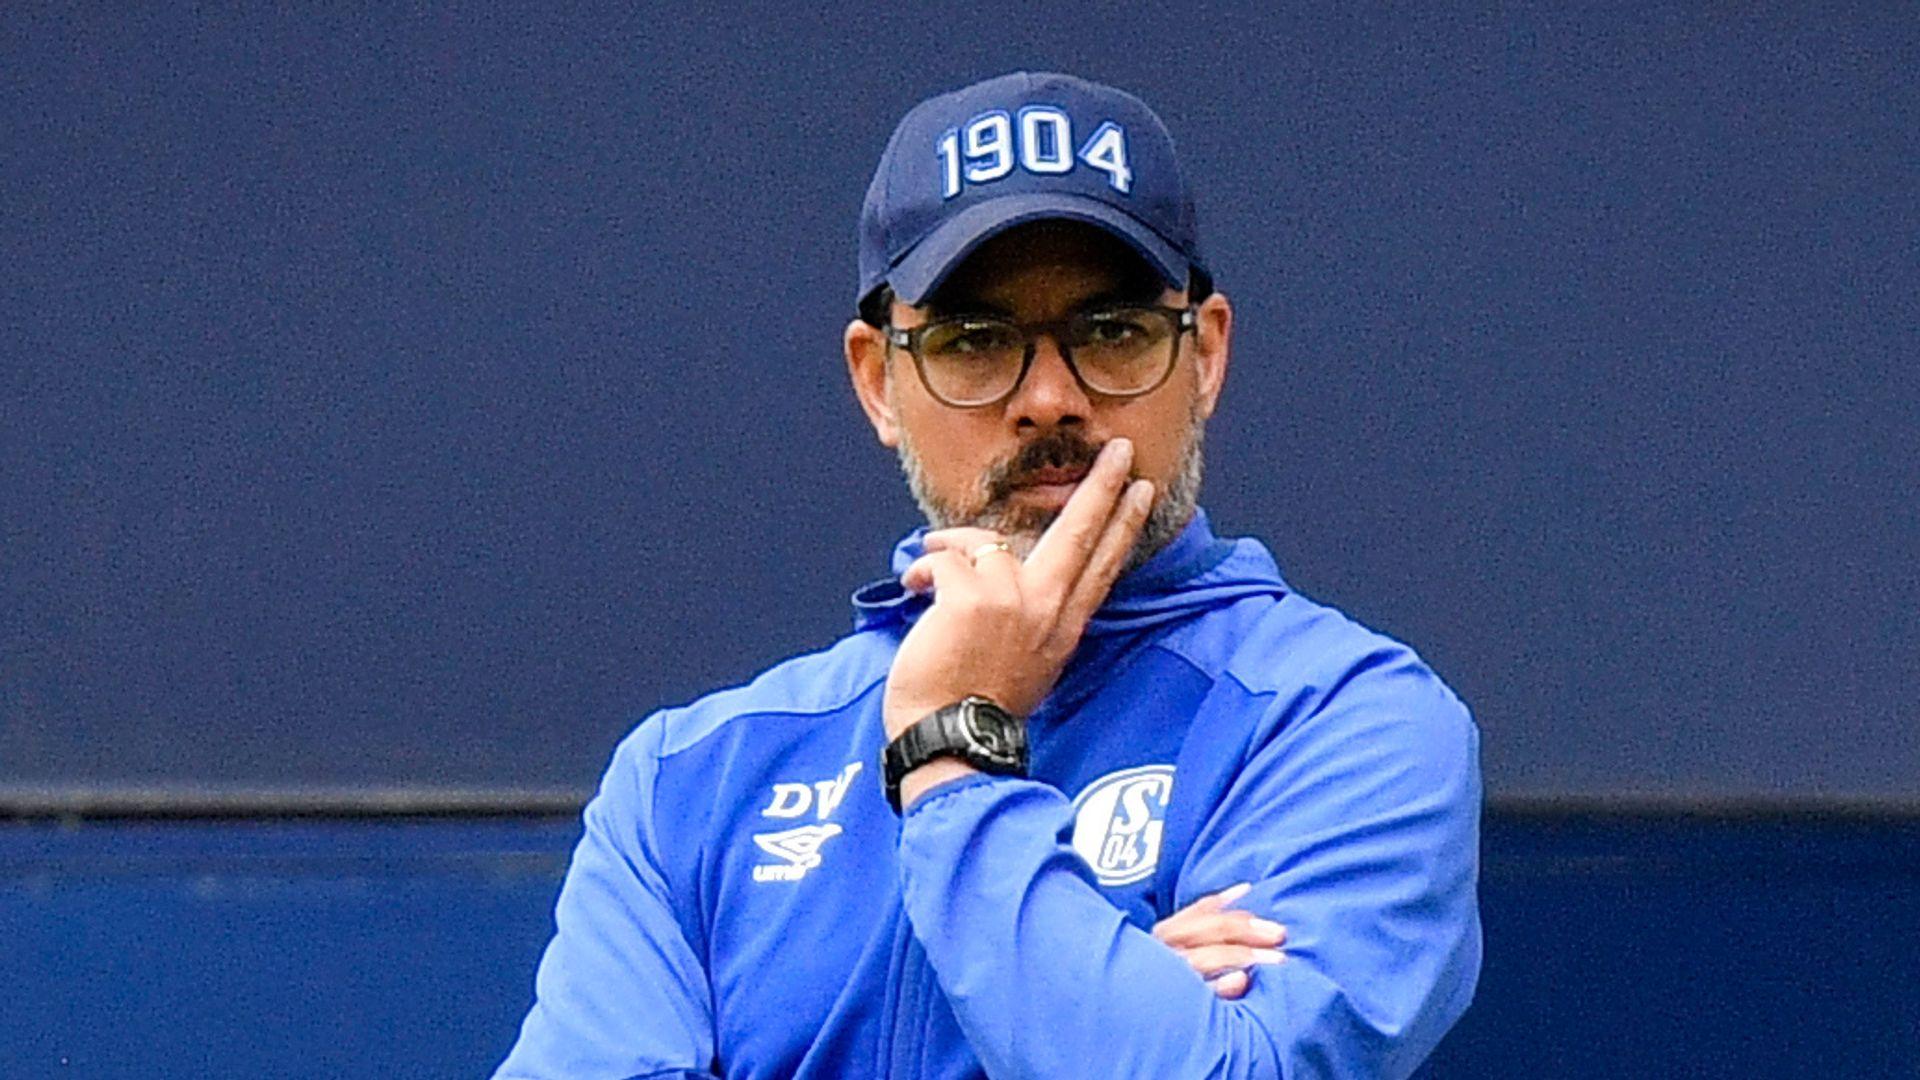 Bundesliga: Schalke slump continues